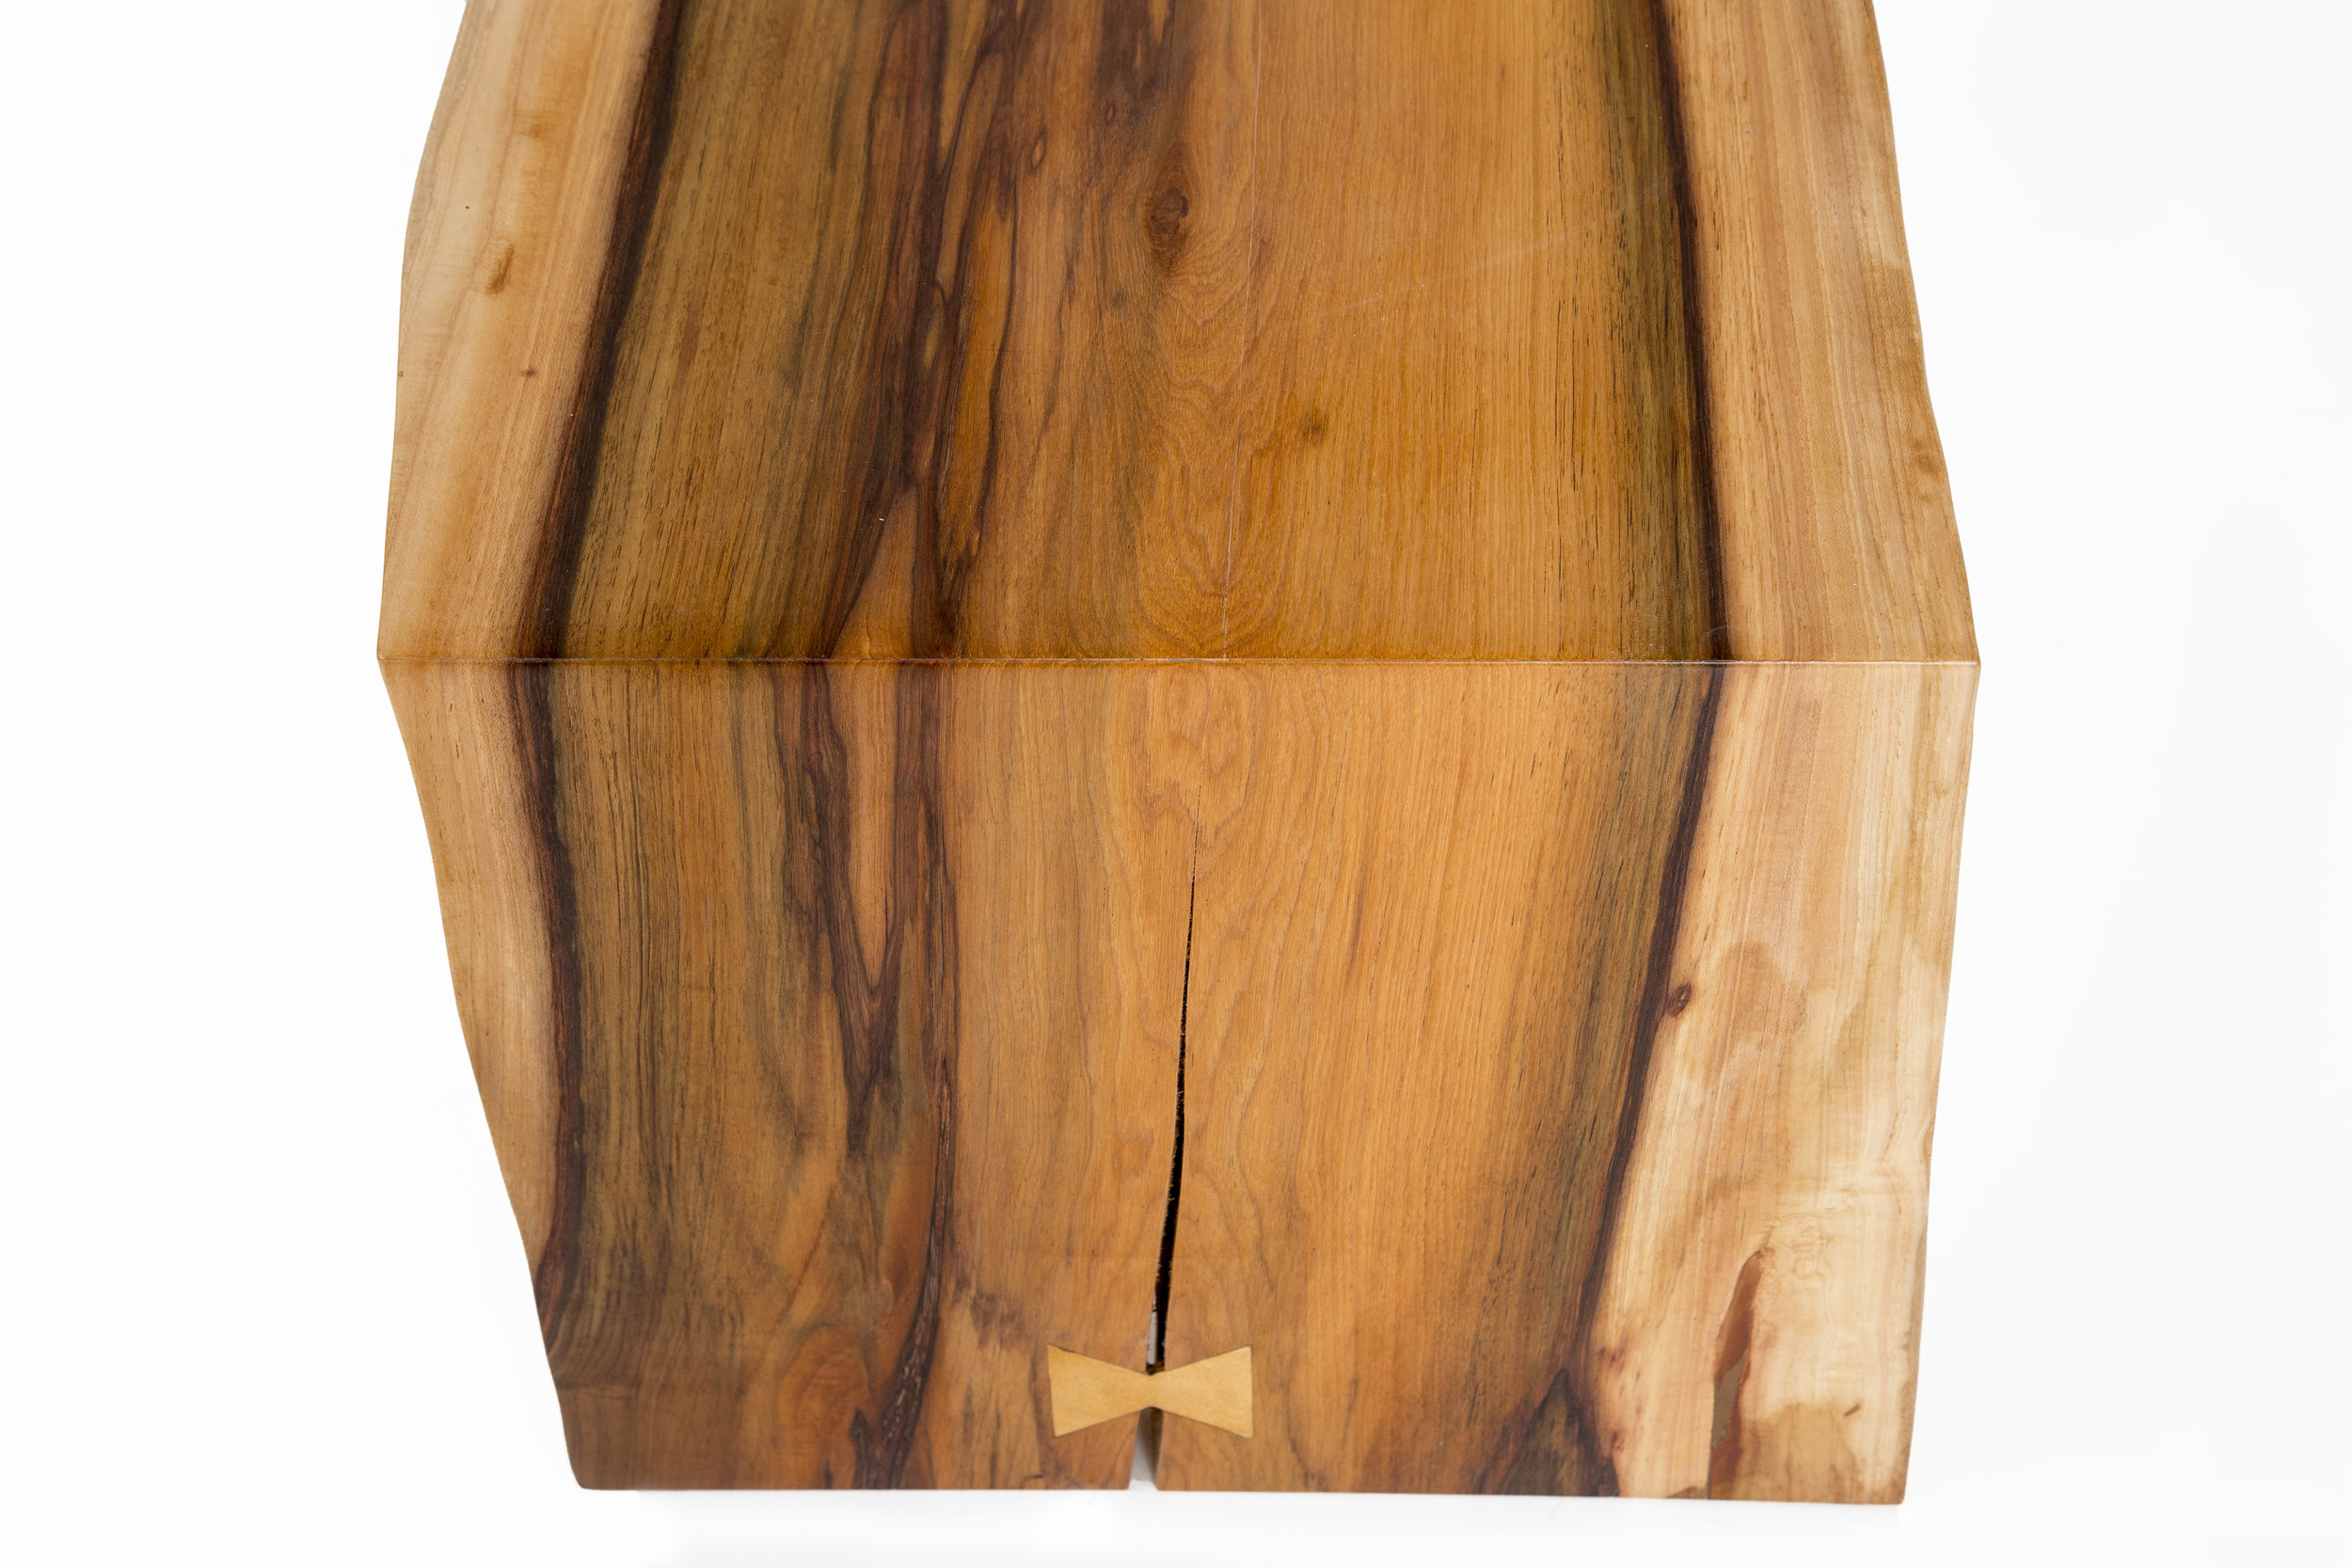 slab wood bench dovetail